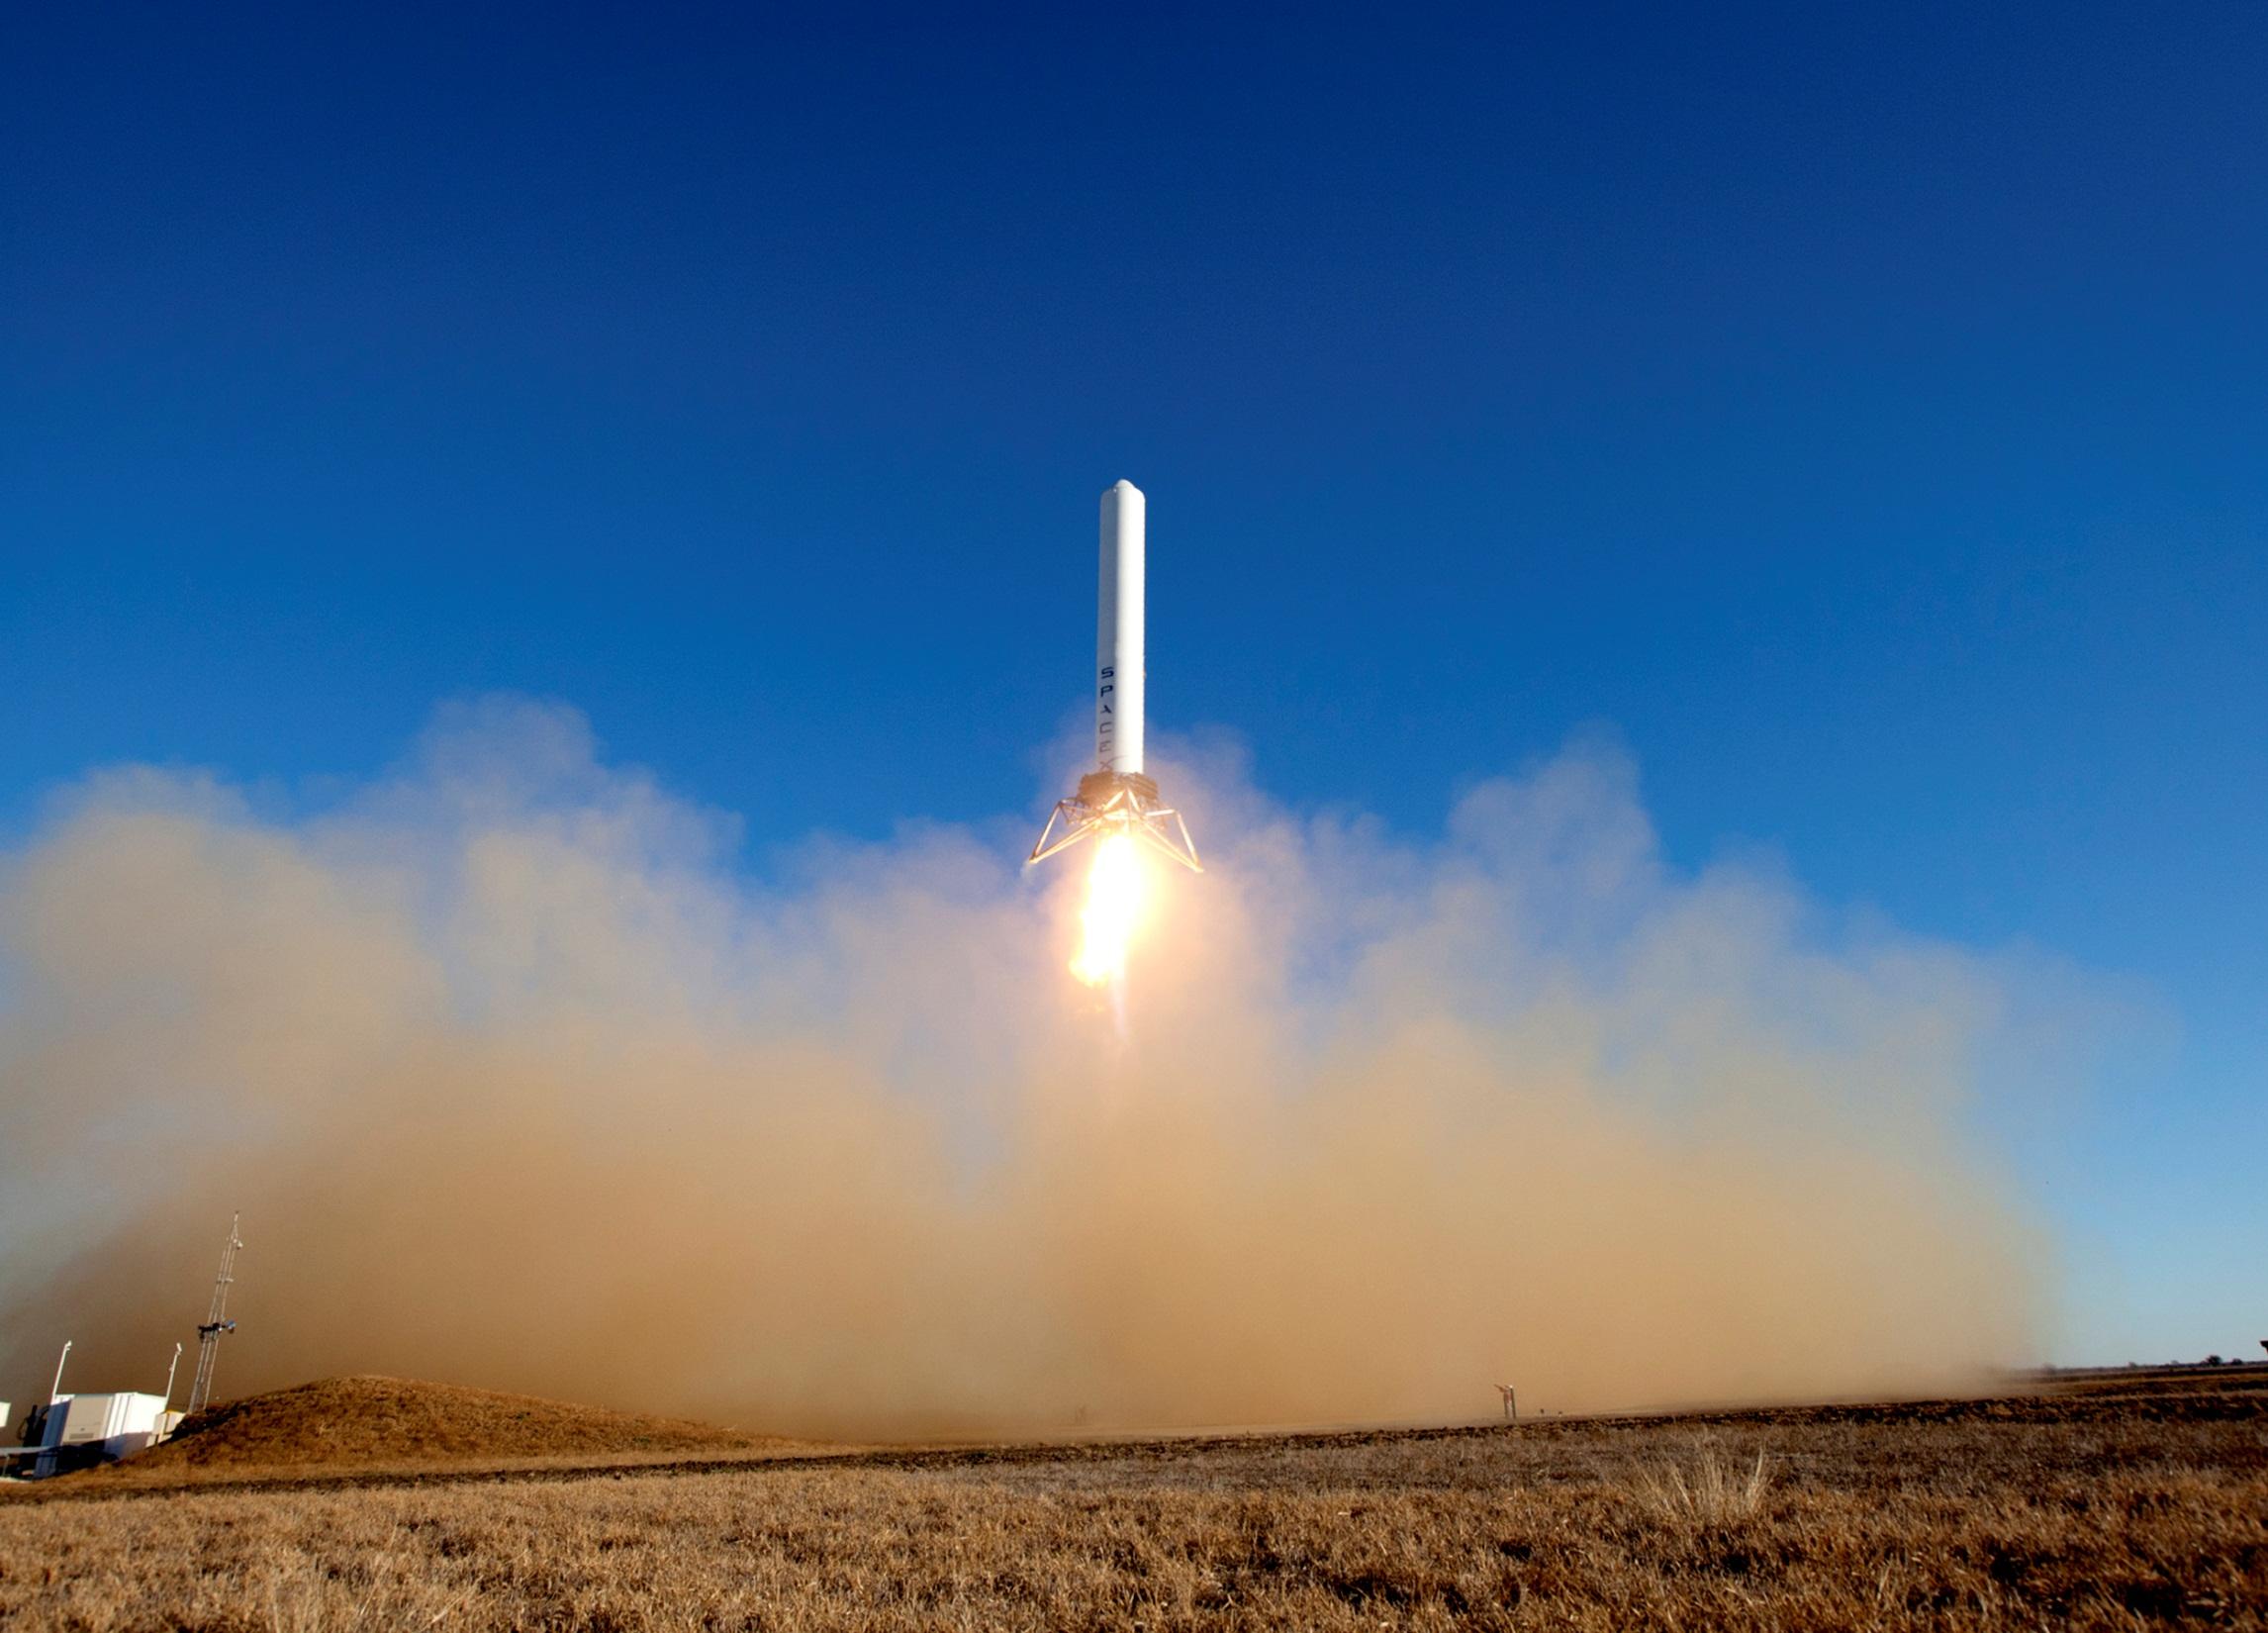 Experimental Private Rocket Makes Highest Test Hop Yet